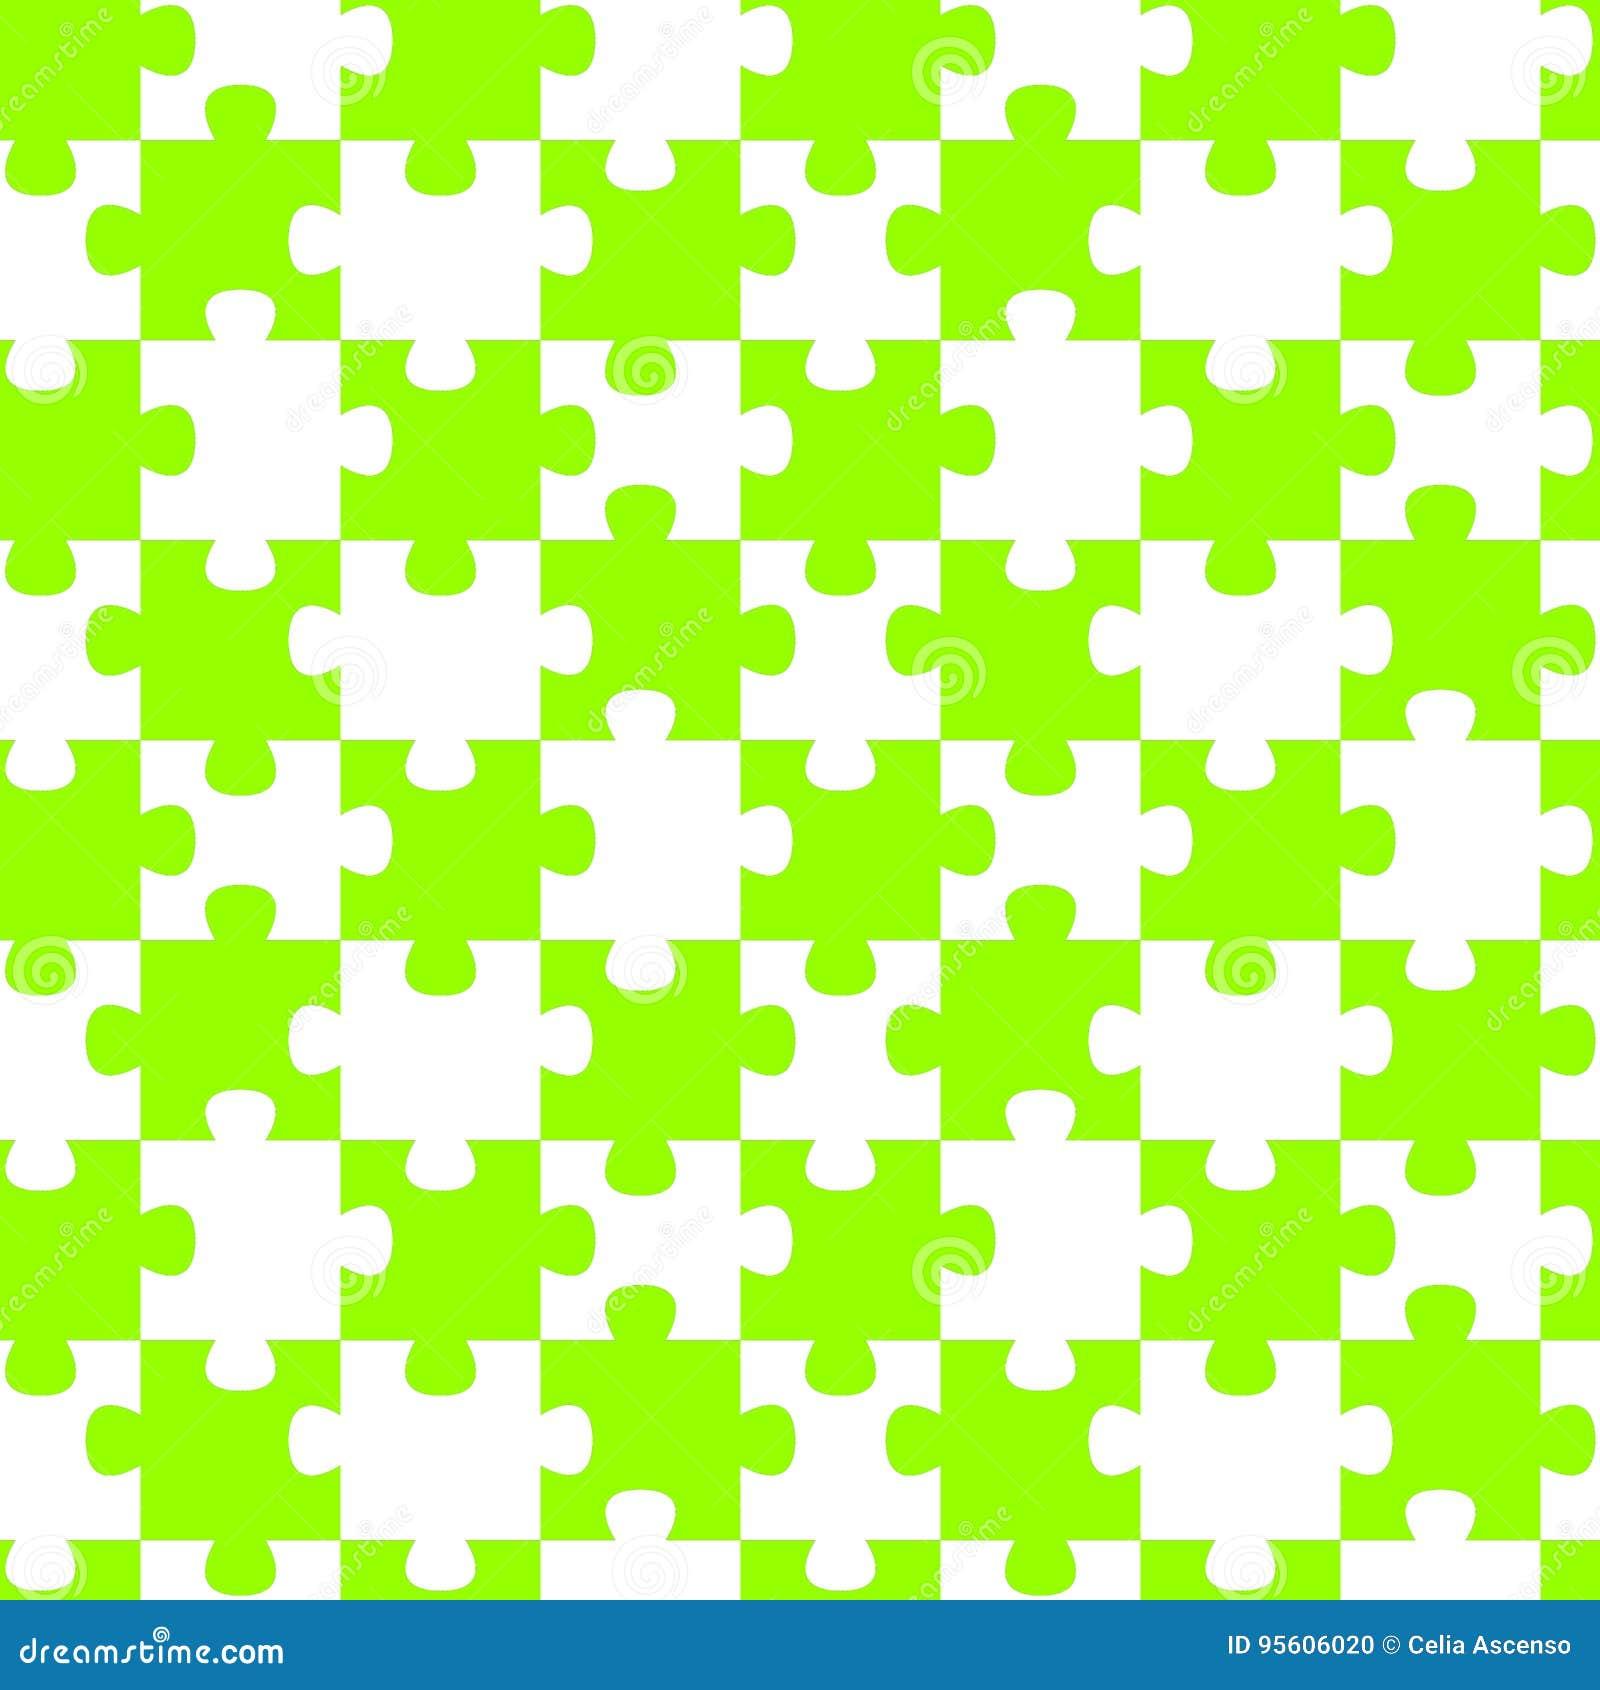 Pattern Puzzles Best Inspiration